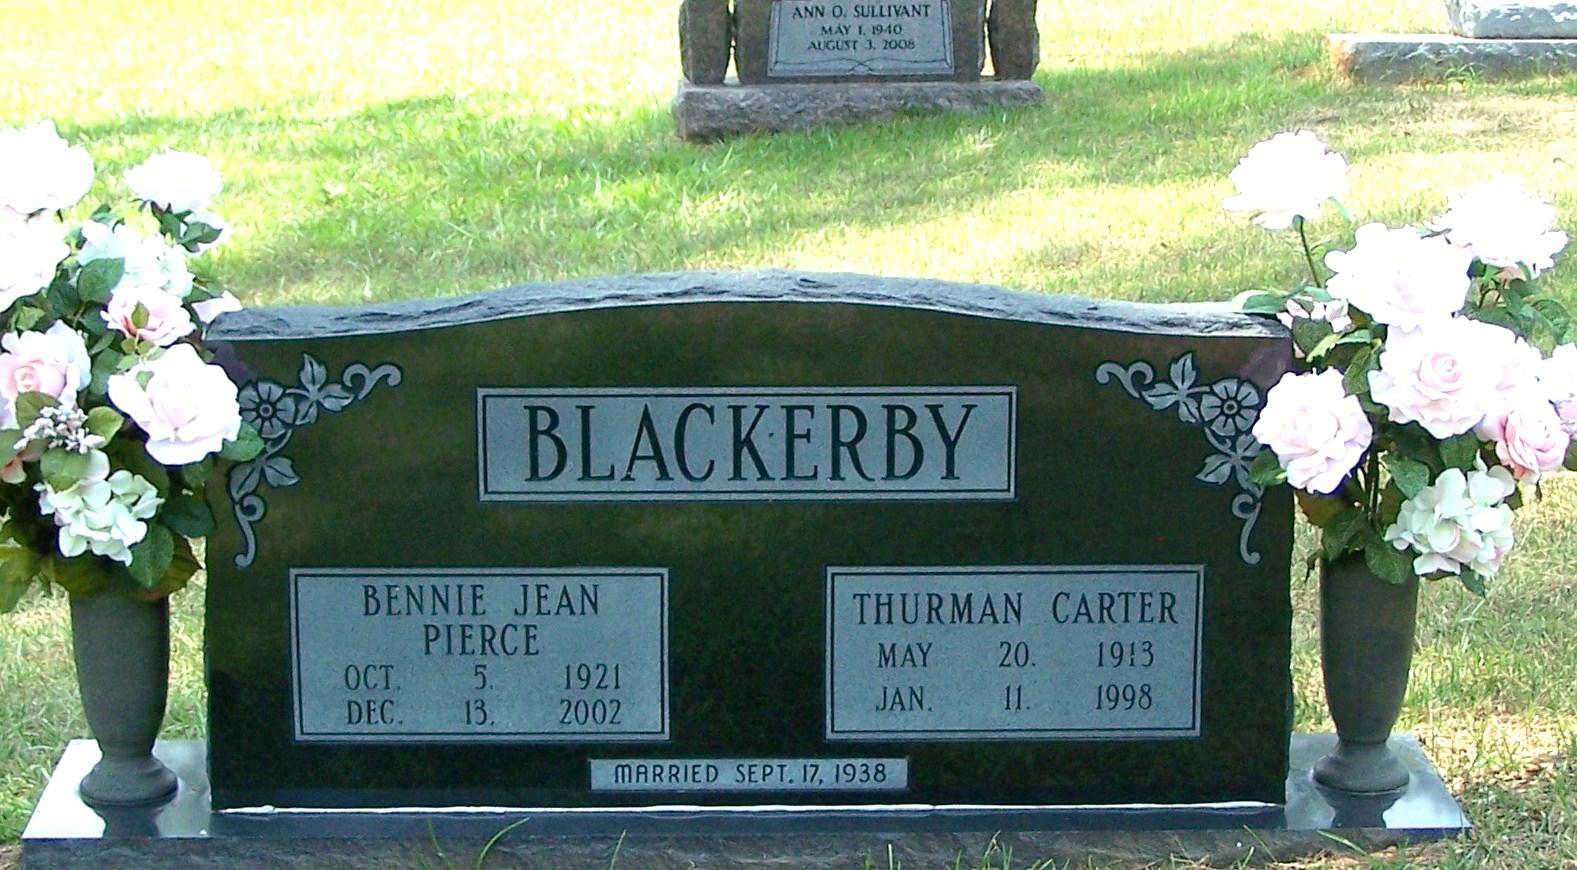 Thurman Carter Blackerby